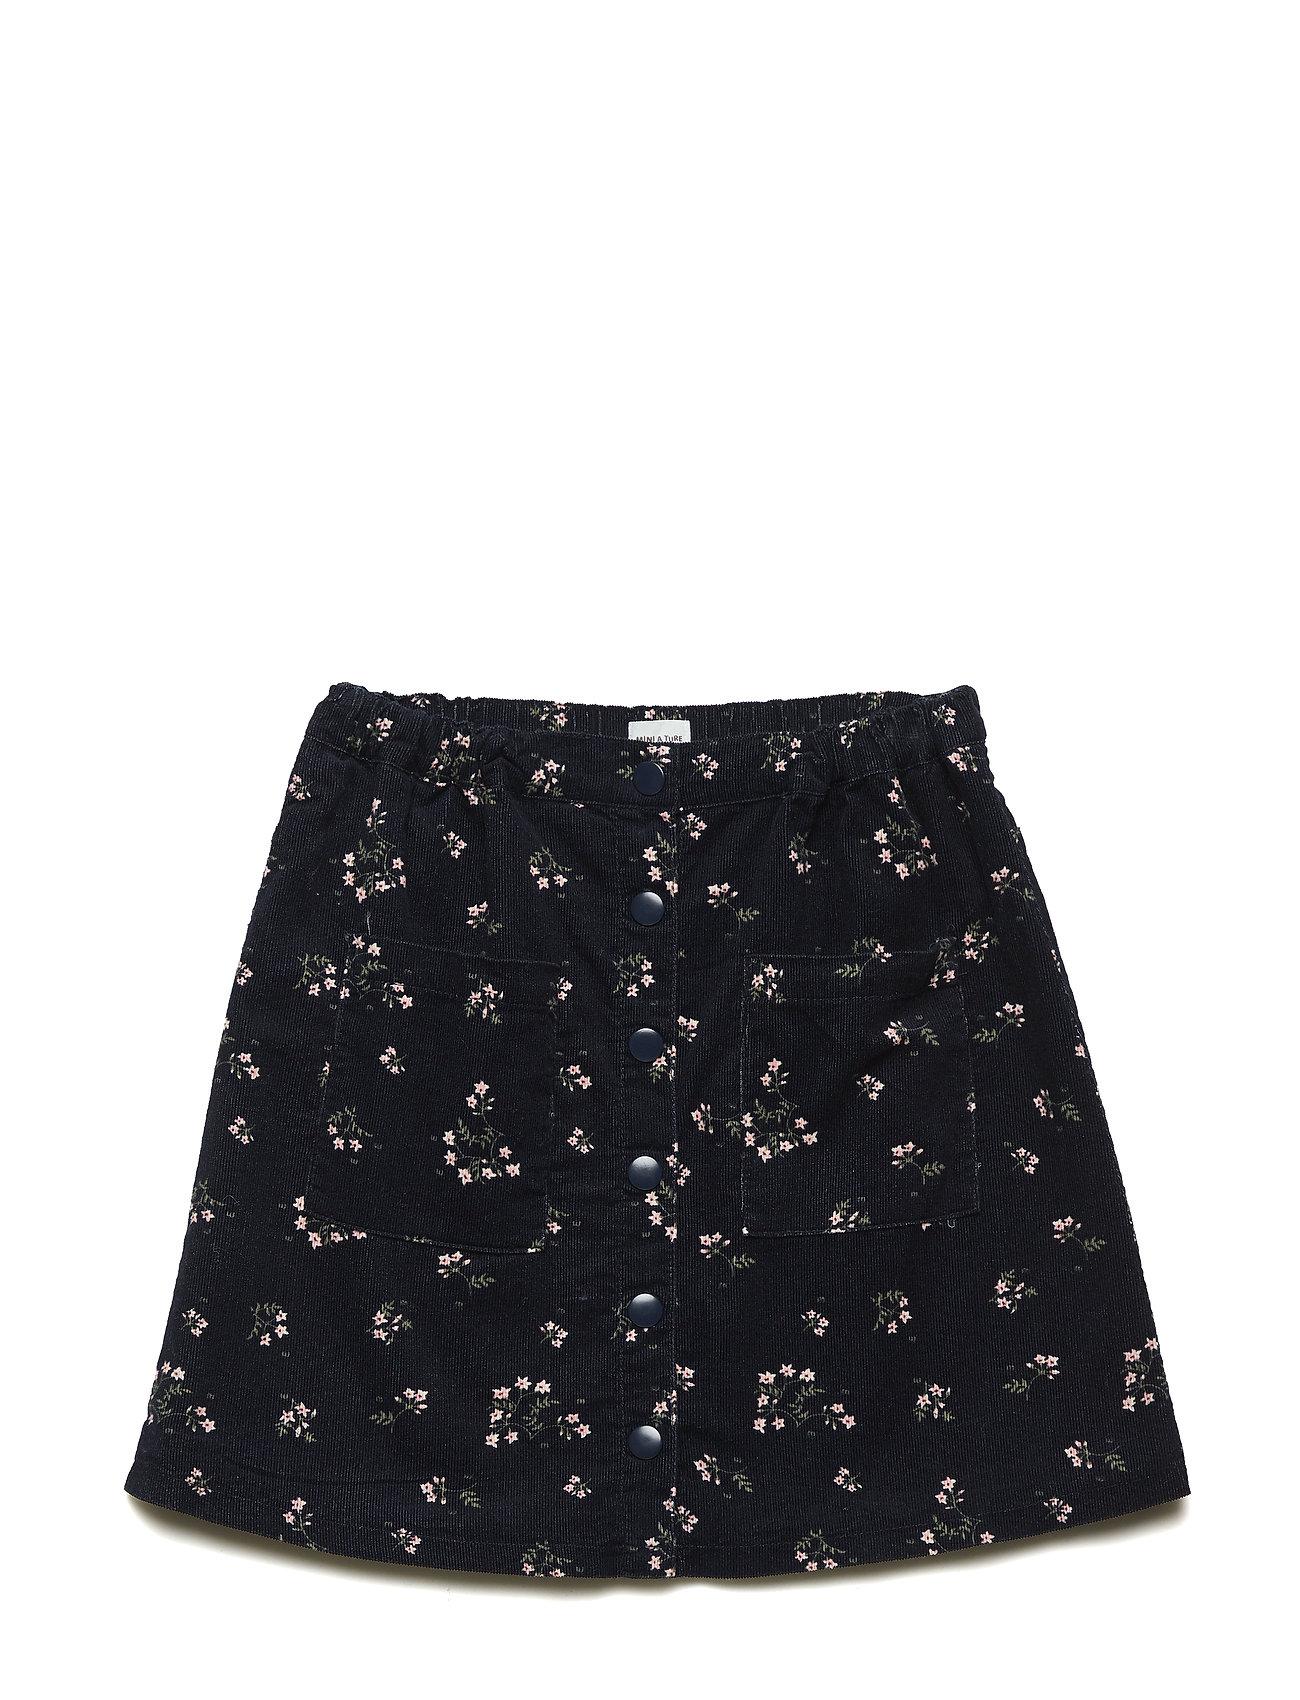 Mini A Ture Billie Skirt, K - SKY CAPTAIN BLUE